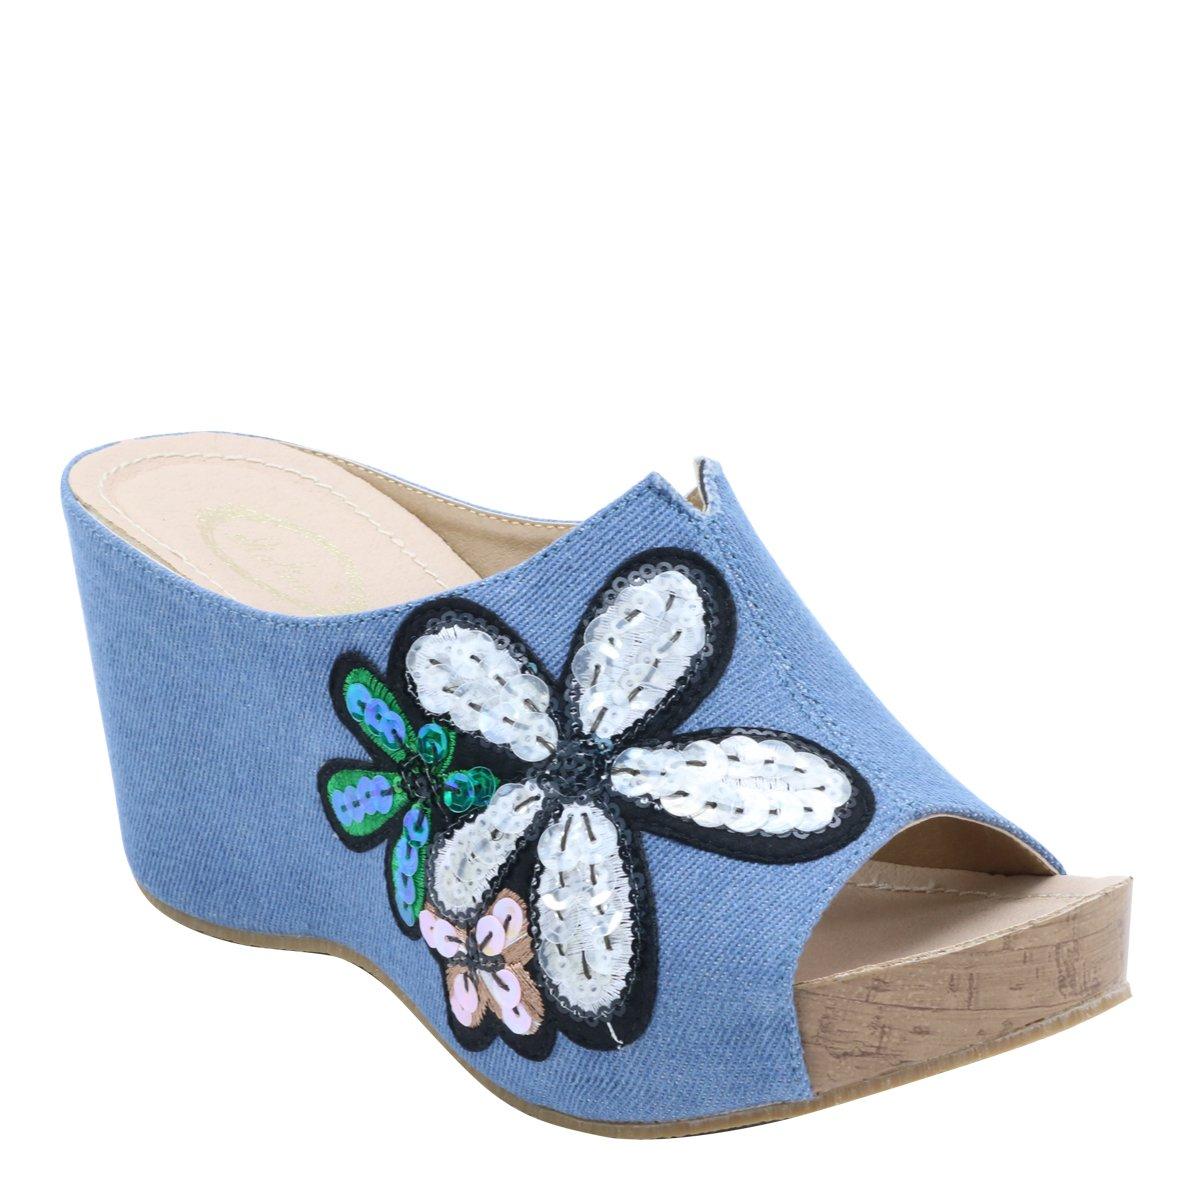 New Master Women's Embroidery Platform Wedge Sandals B0749H3G3Q 8 B(M) US|Blue Denim